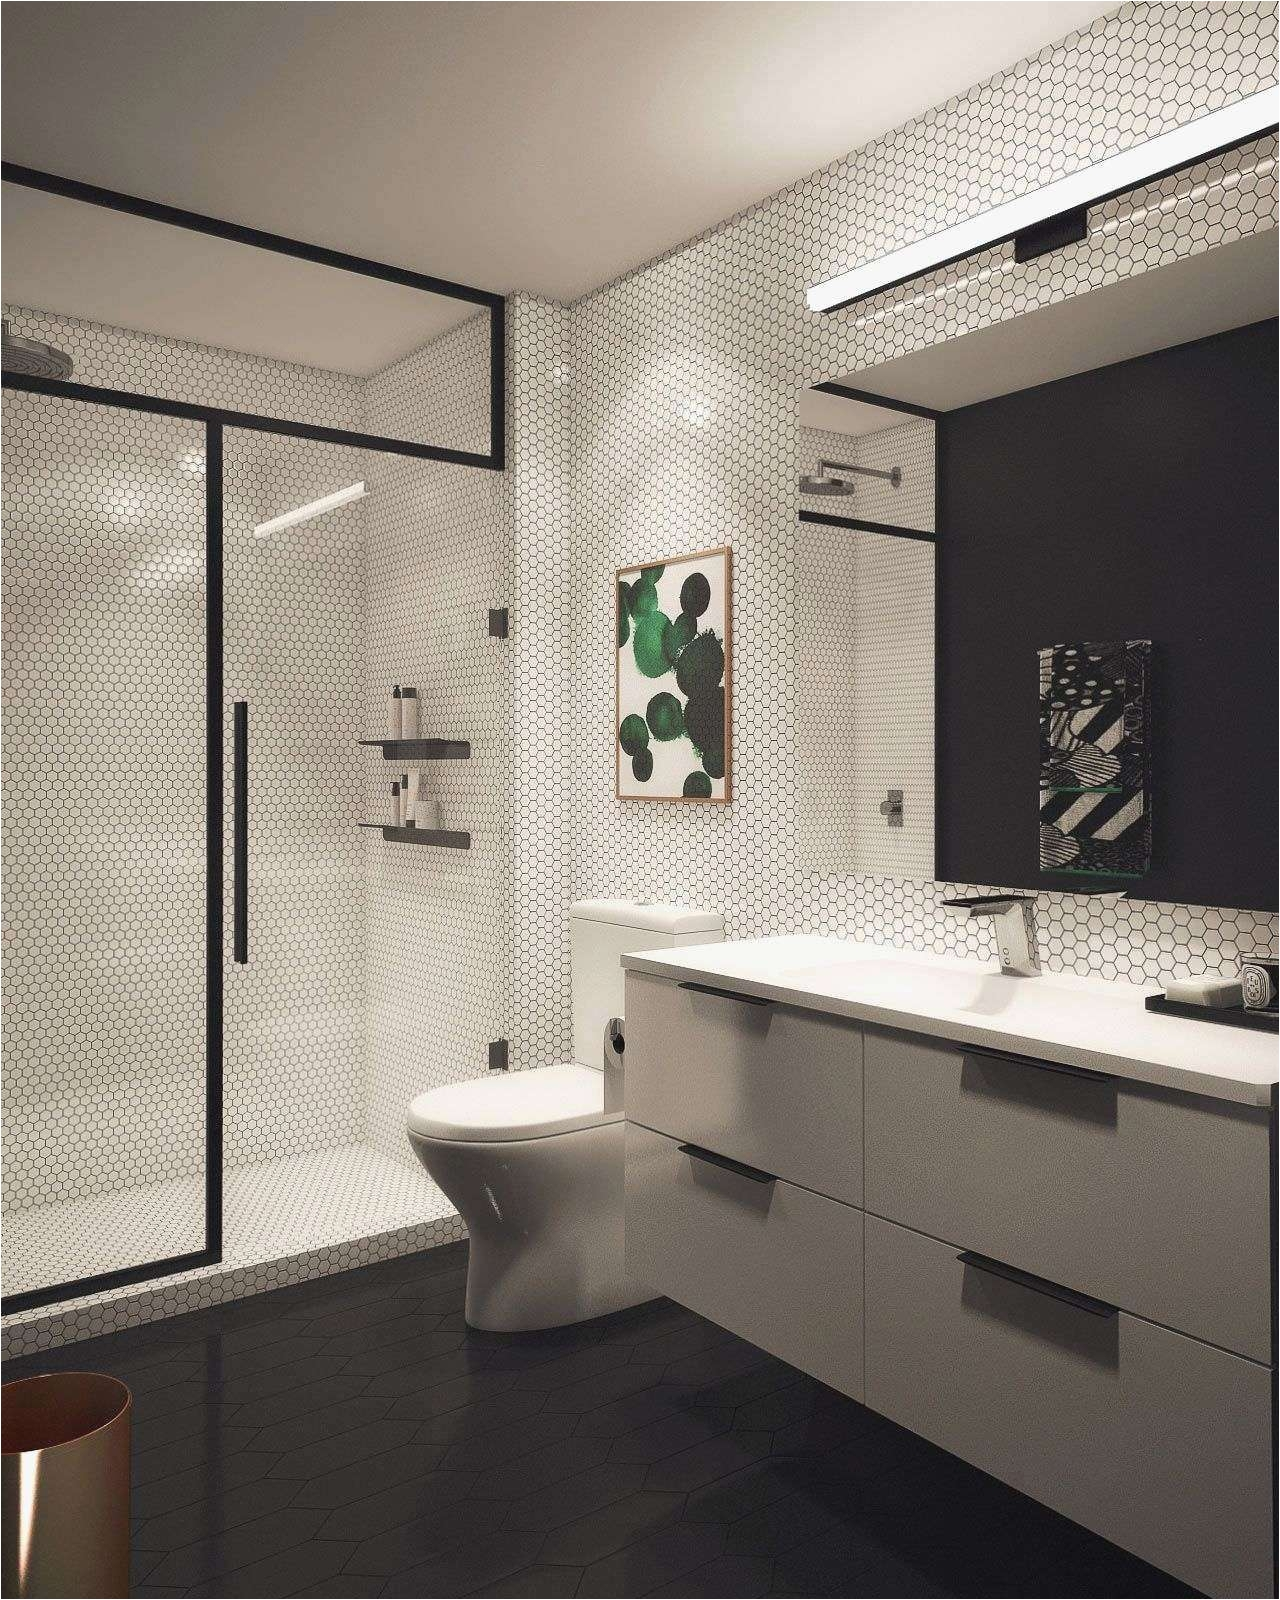 Bathrooms Designs Unique Design Ideas For Small Bathrooms